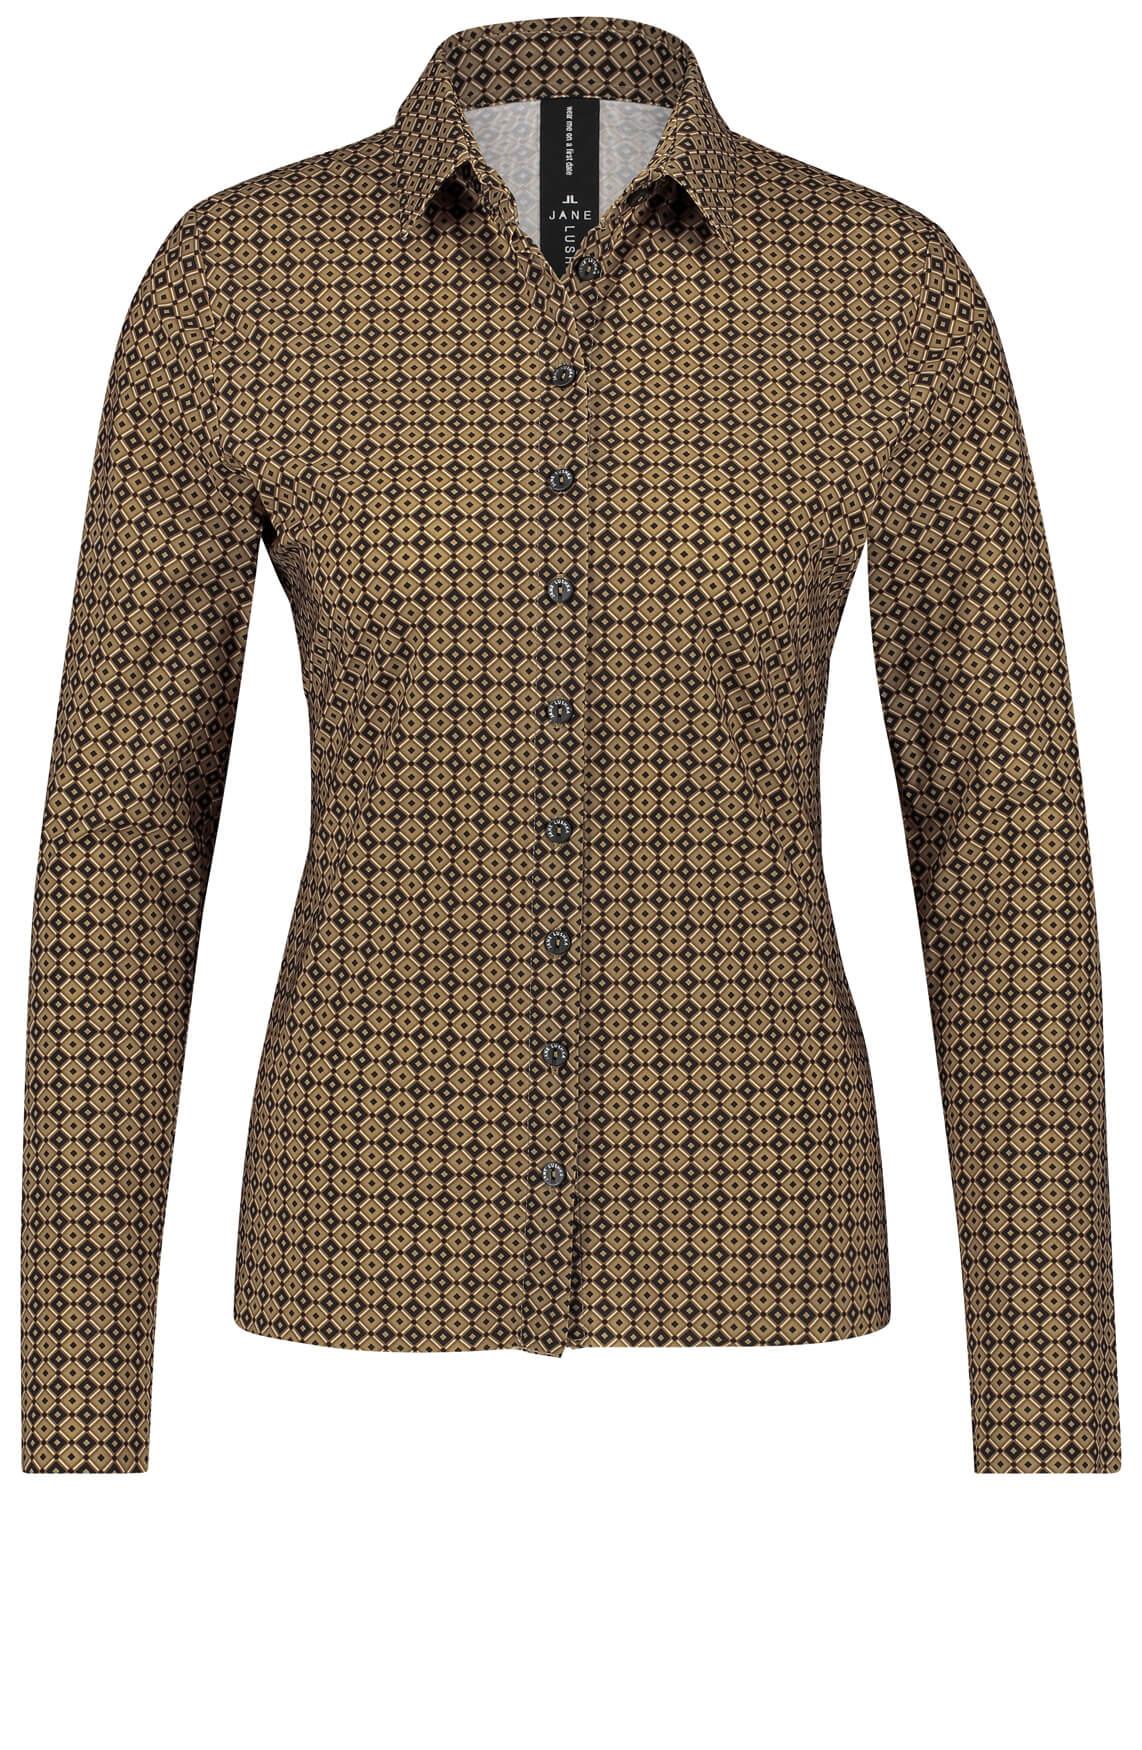 Jane Lushka Dames Kikkie blouse met print Bruin